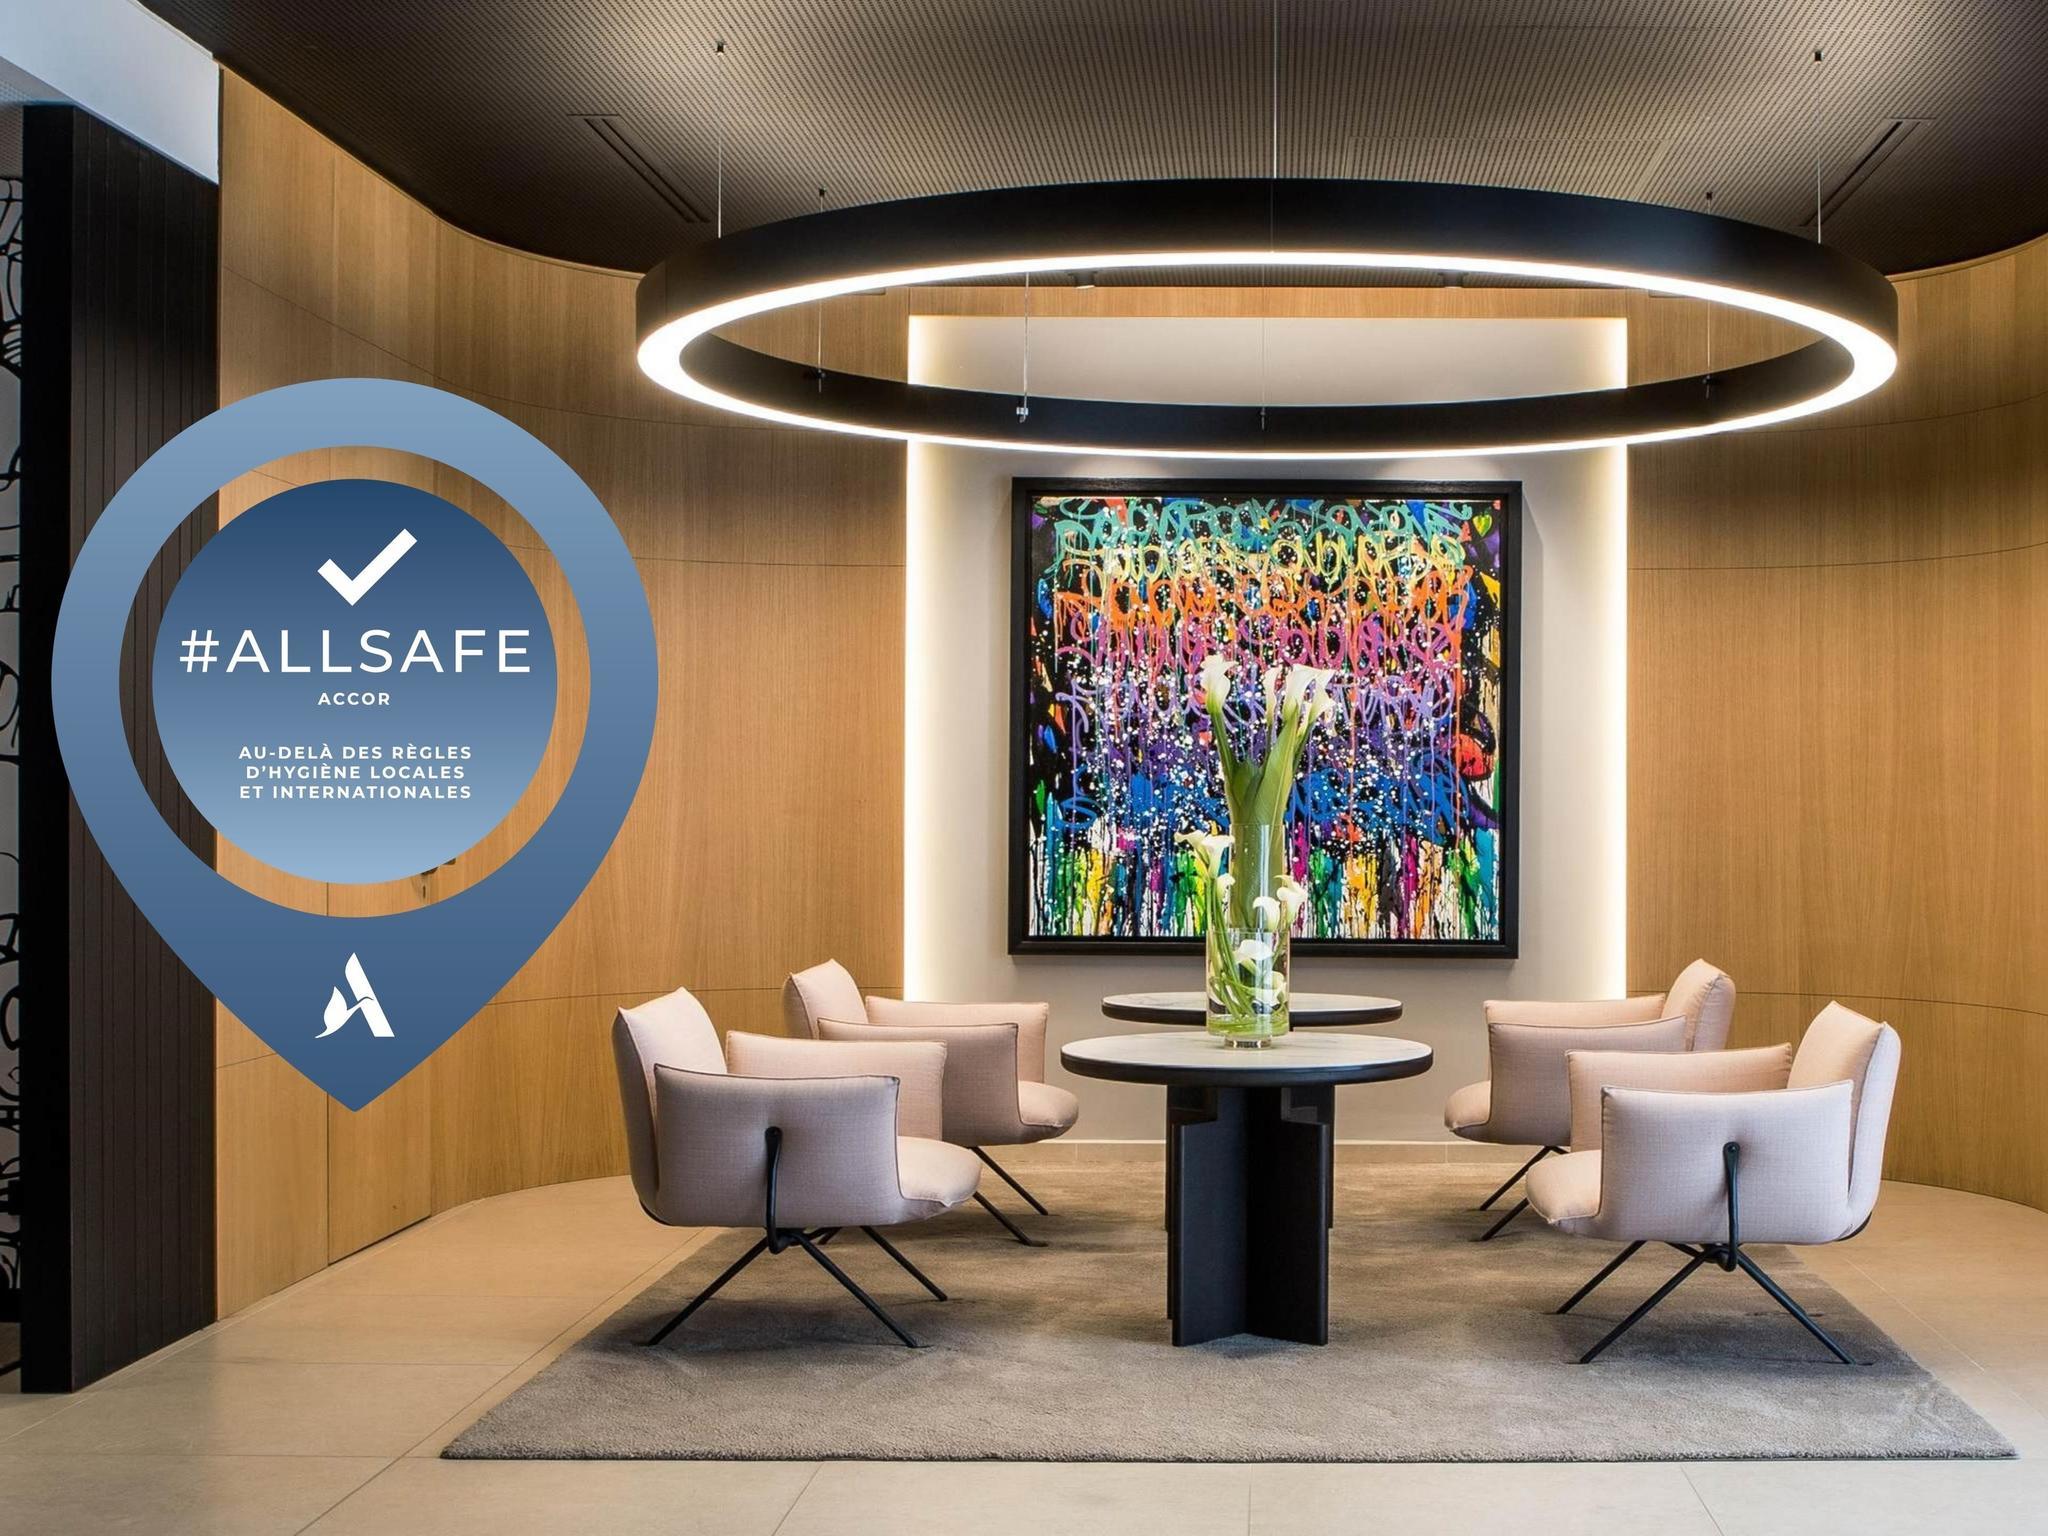 Hotel – Mercure Paris 17 Batignolles (apertura en mayo de 2018)